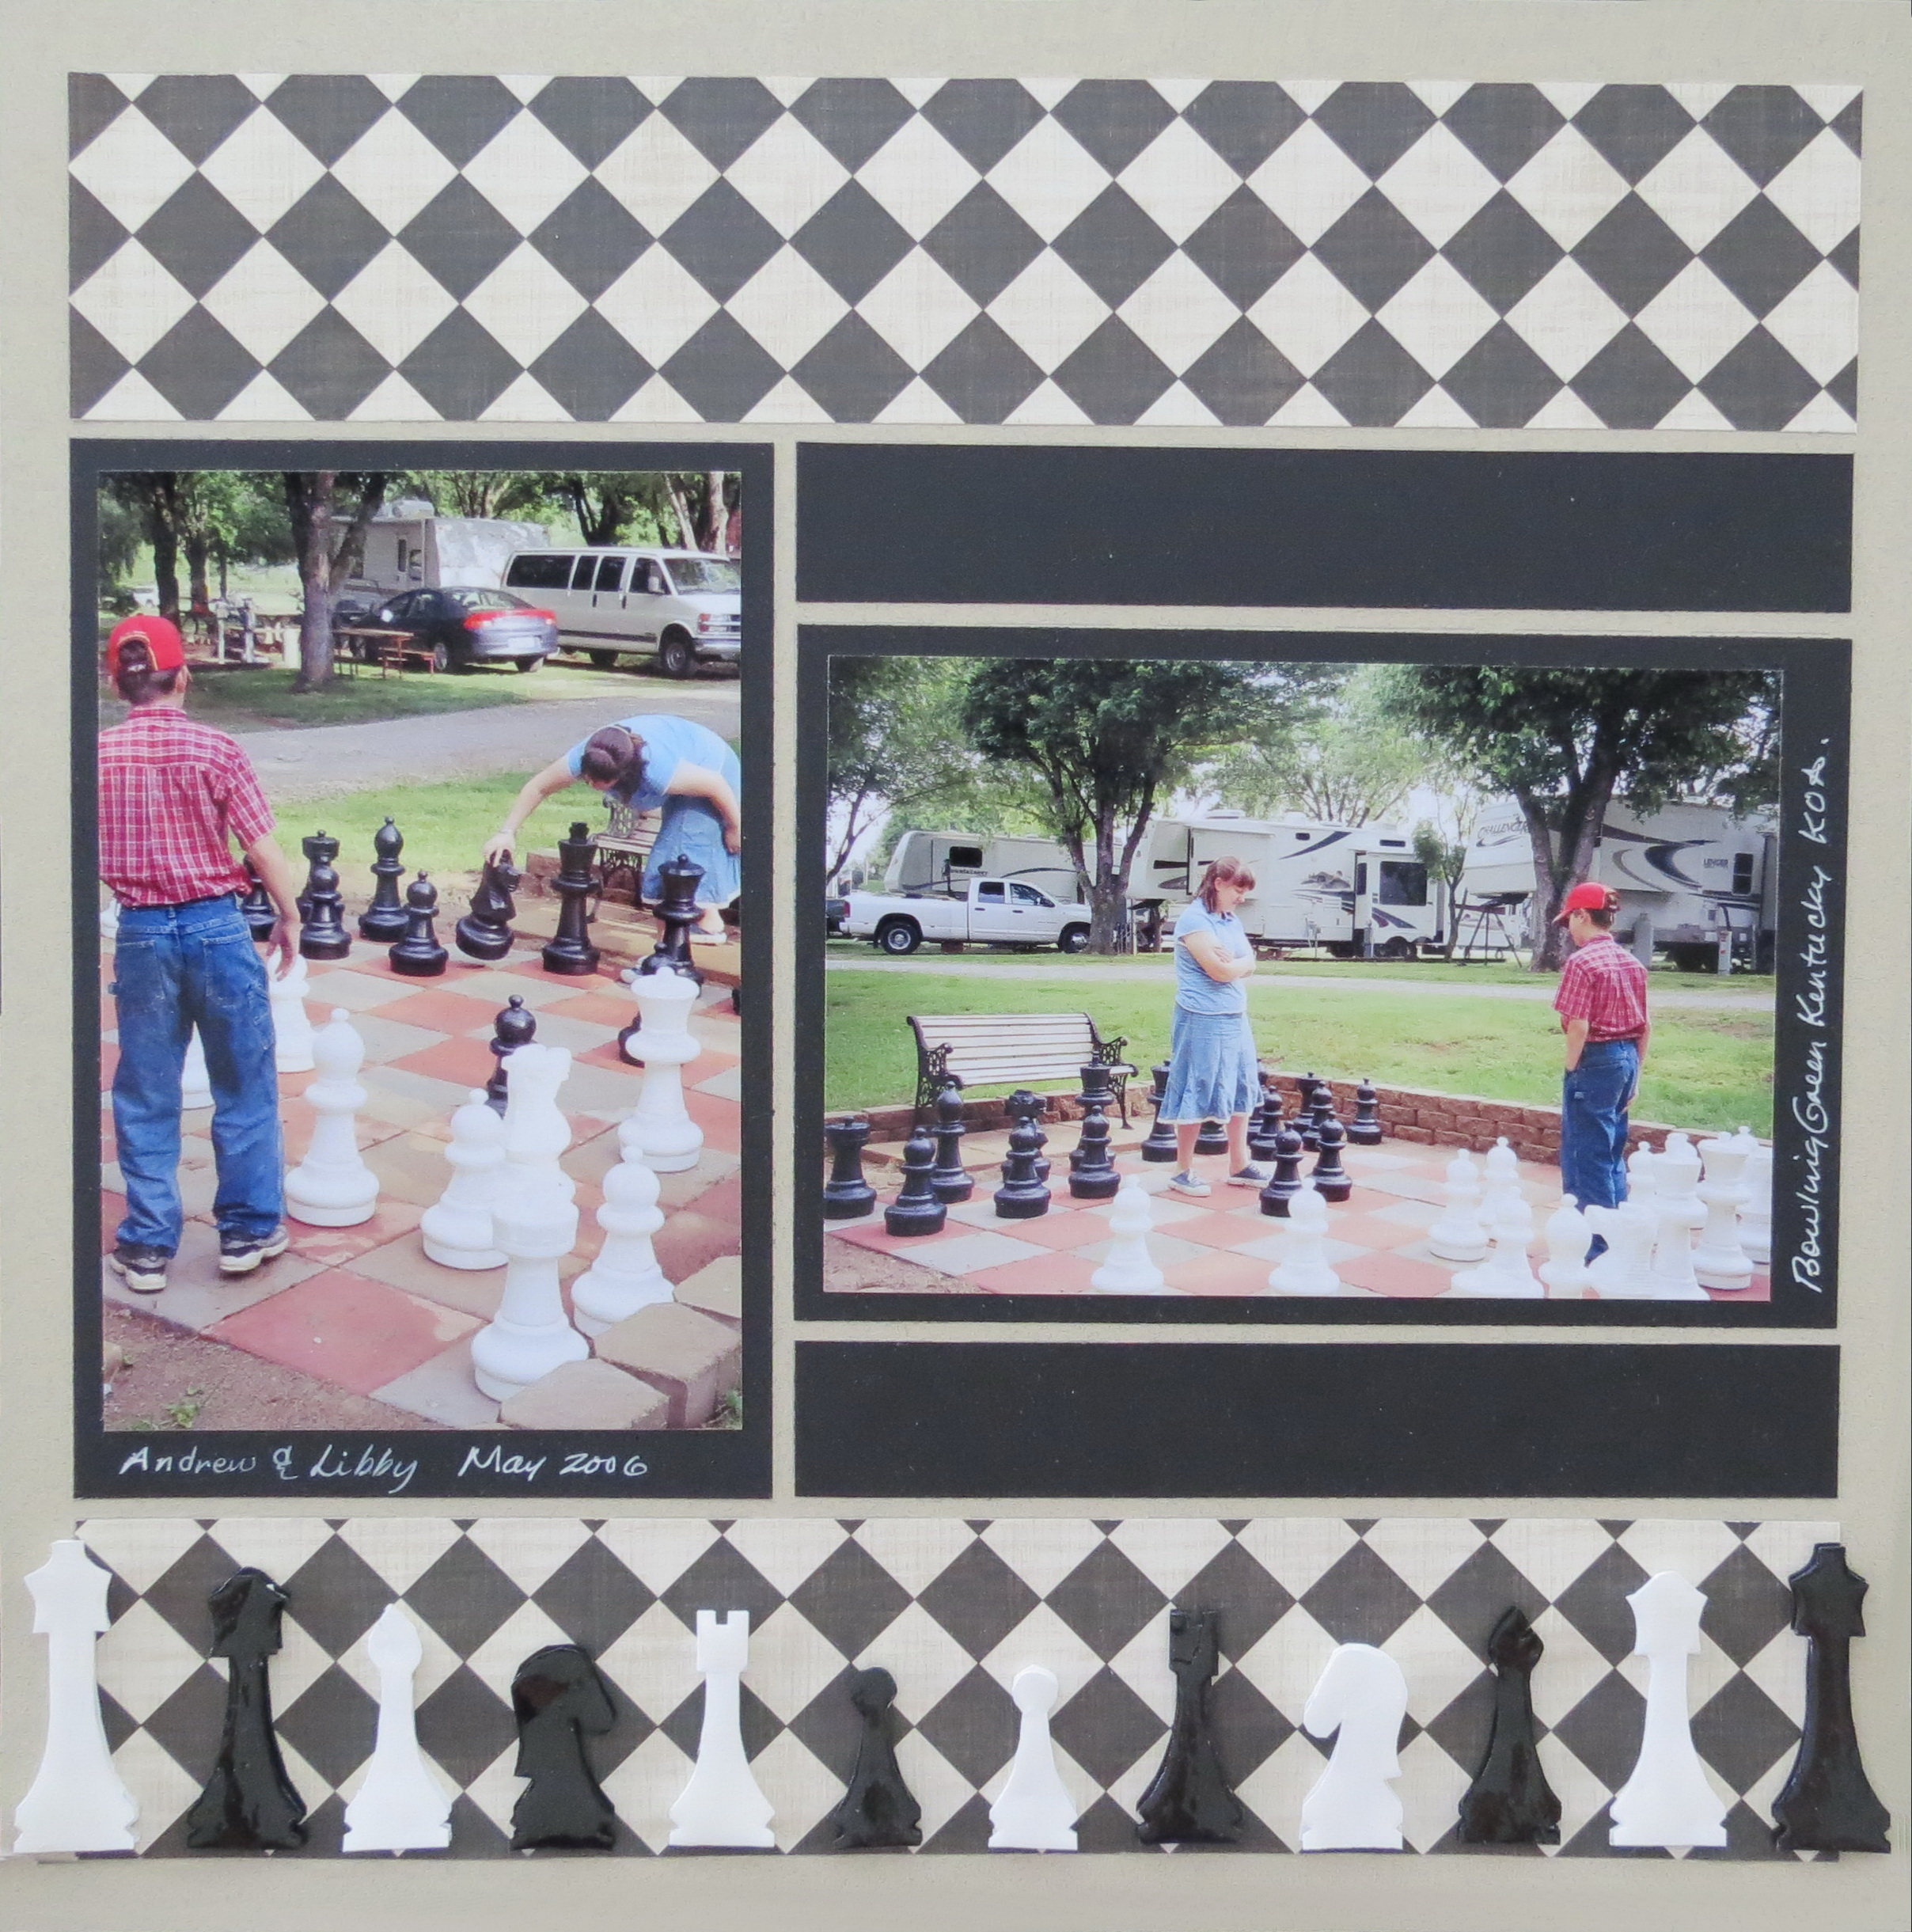 How to scrapbook memories - Mm Scrapbooking Vacation Memories 280 Chess Club Bowling Green Kentucky Koa